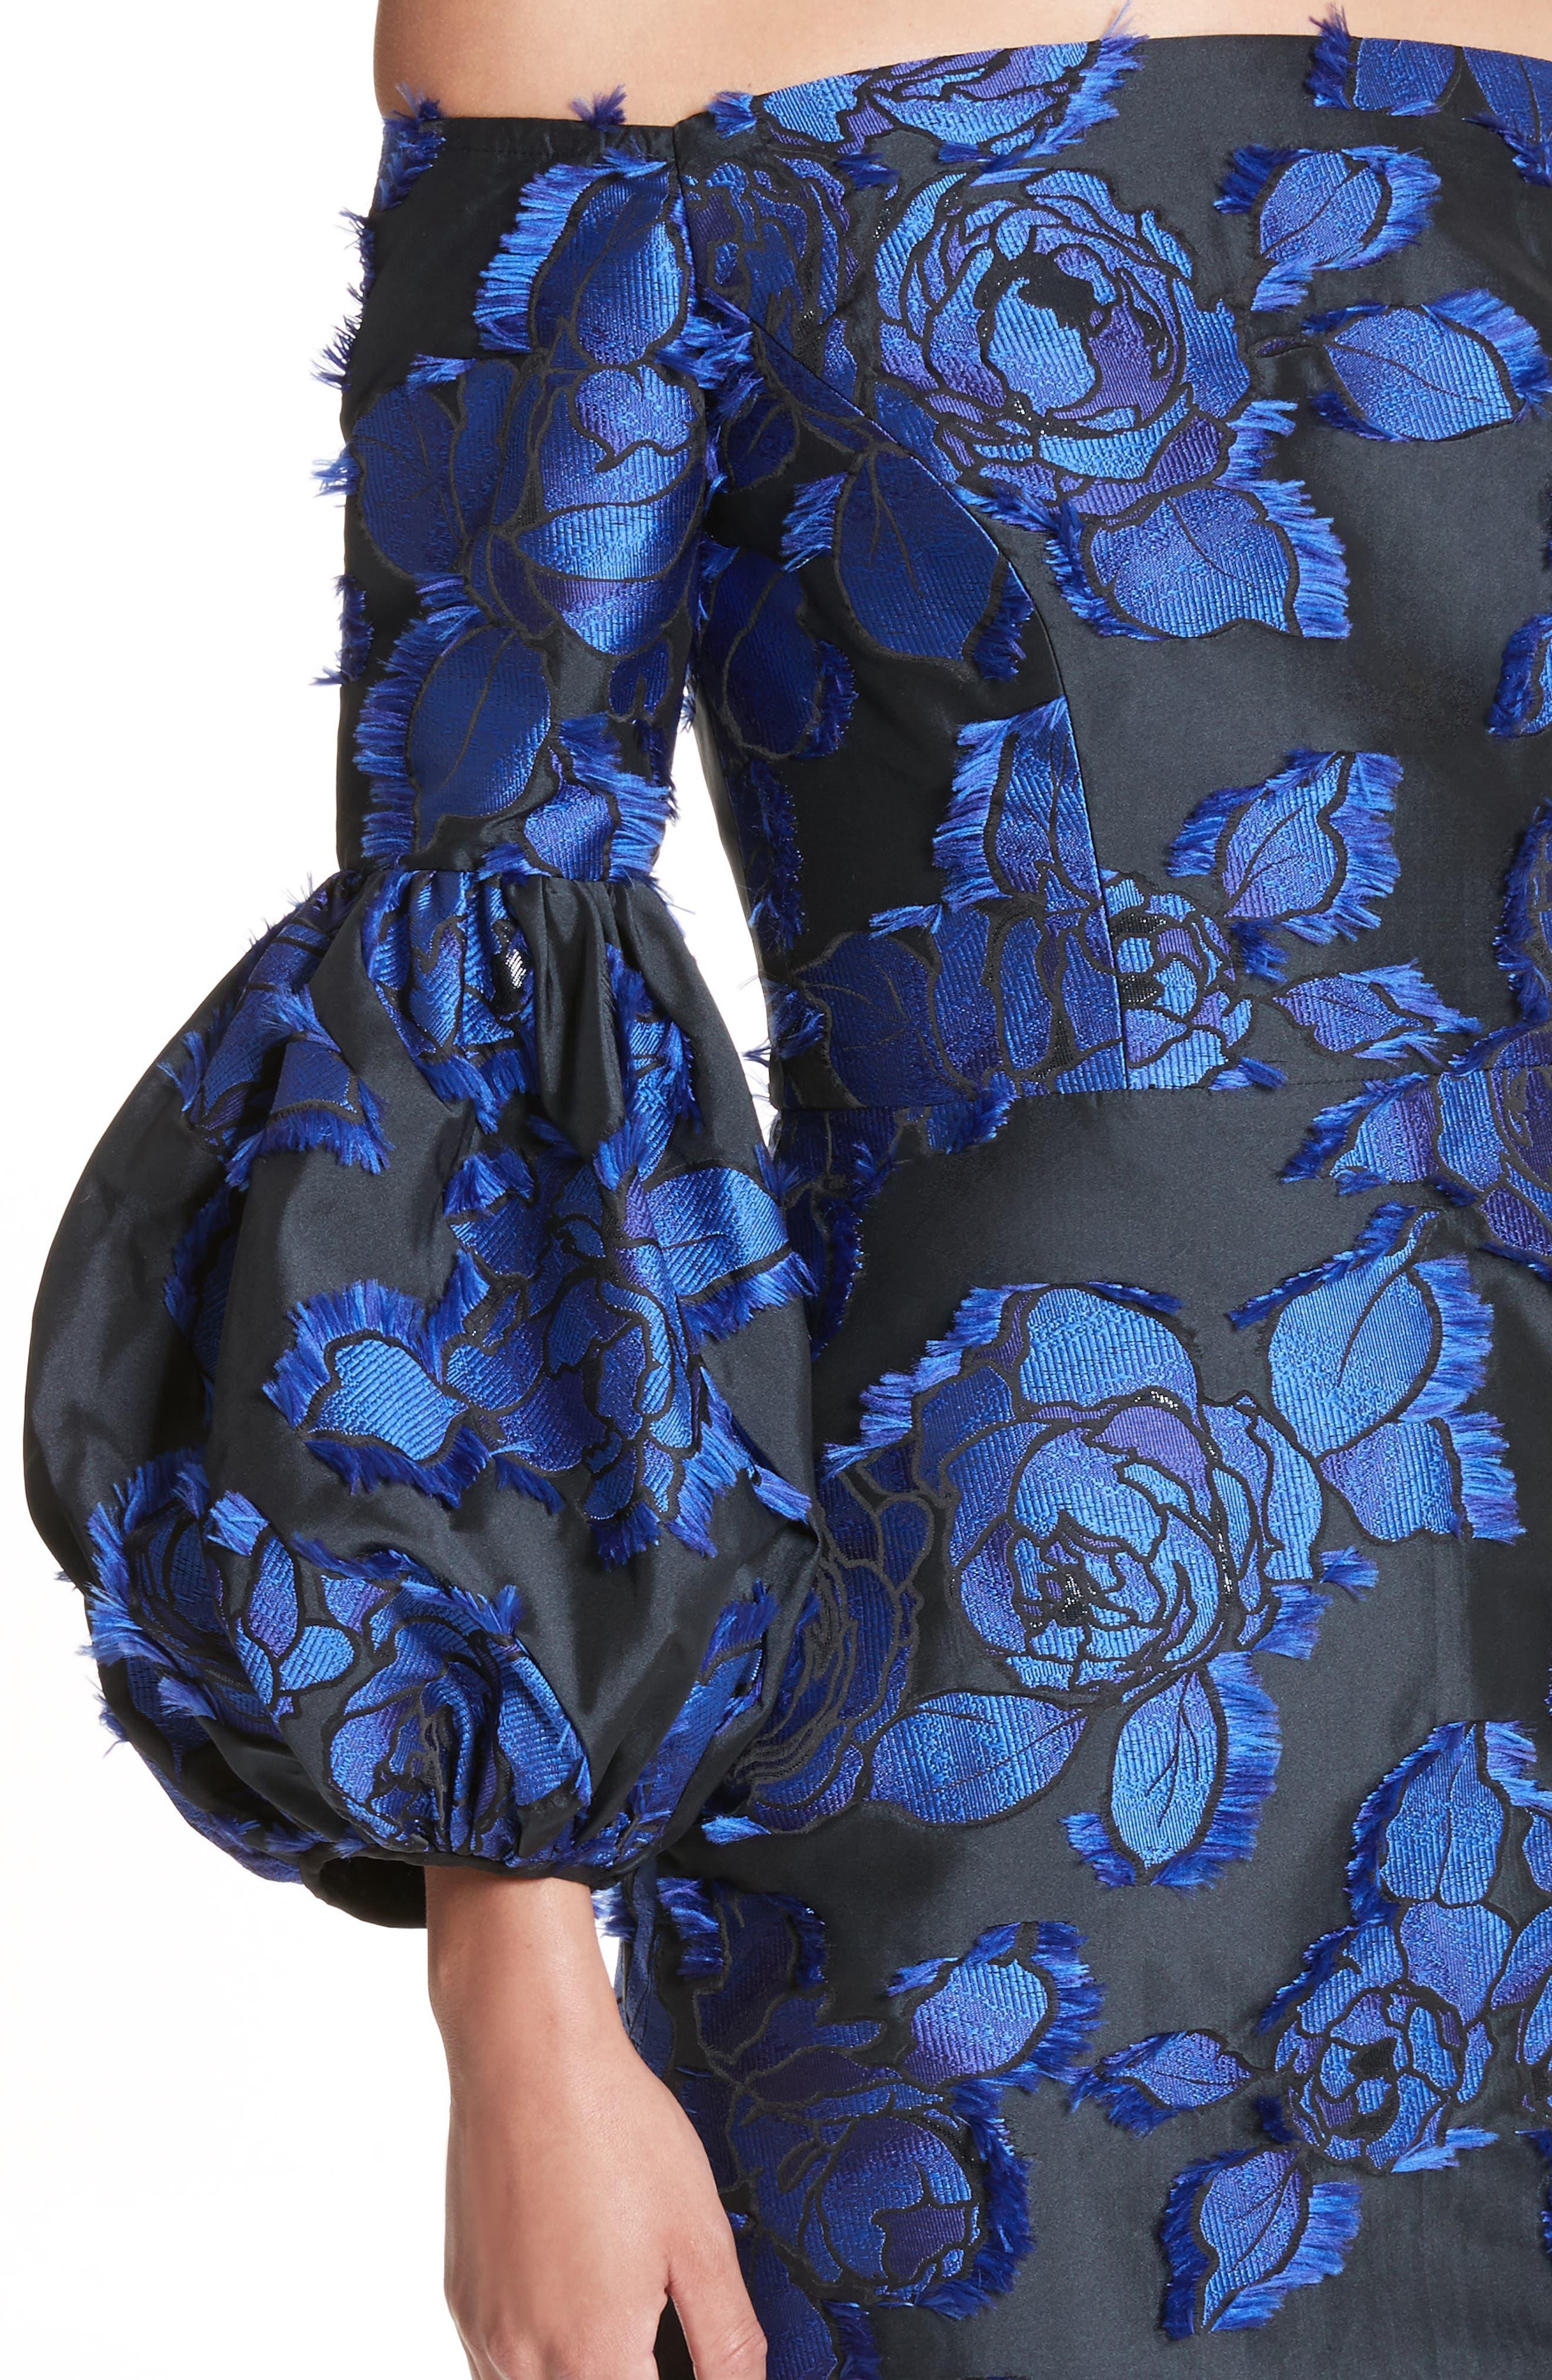 Fring Brocade Puff Sleeve Dress,                             Alternate thumbnail 7, color,                             Black/ Lapis